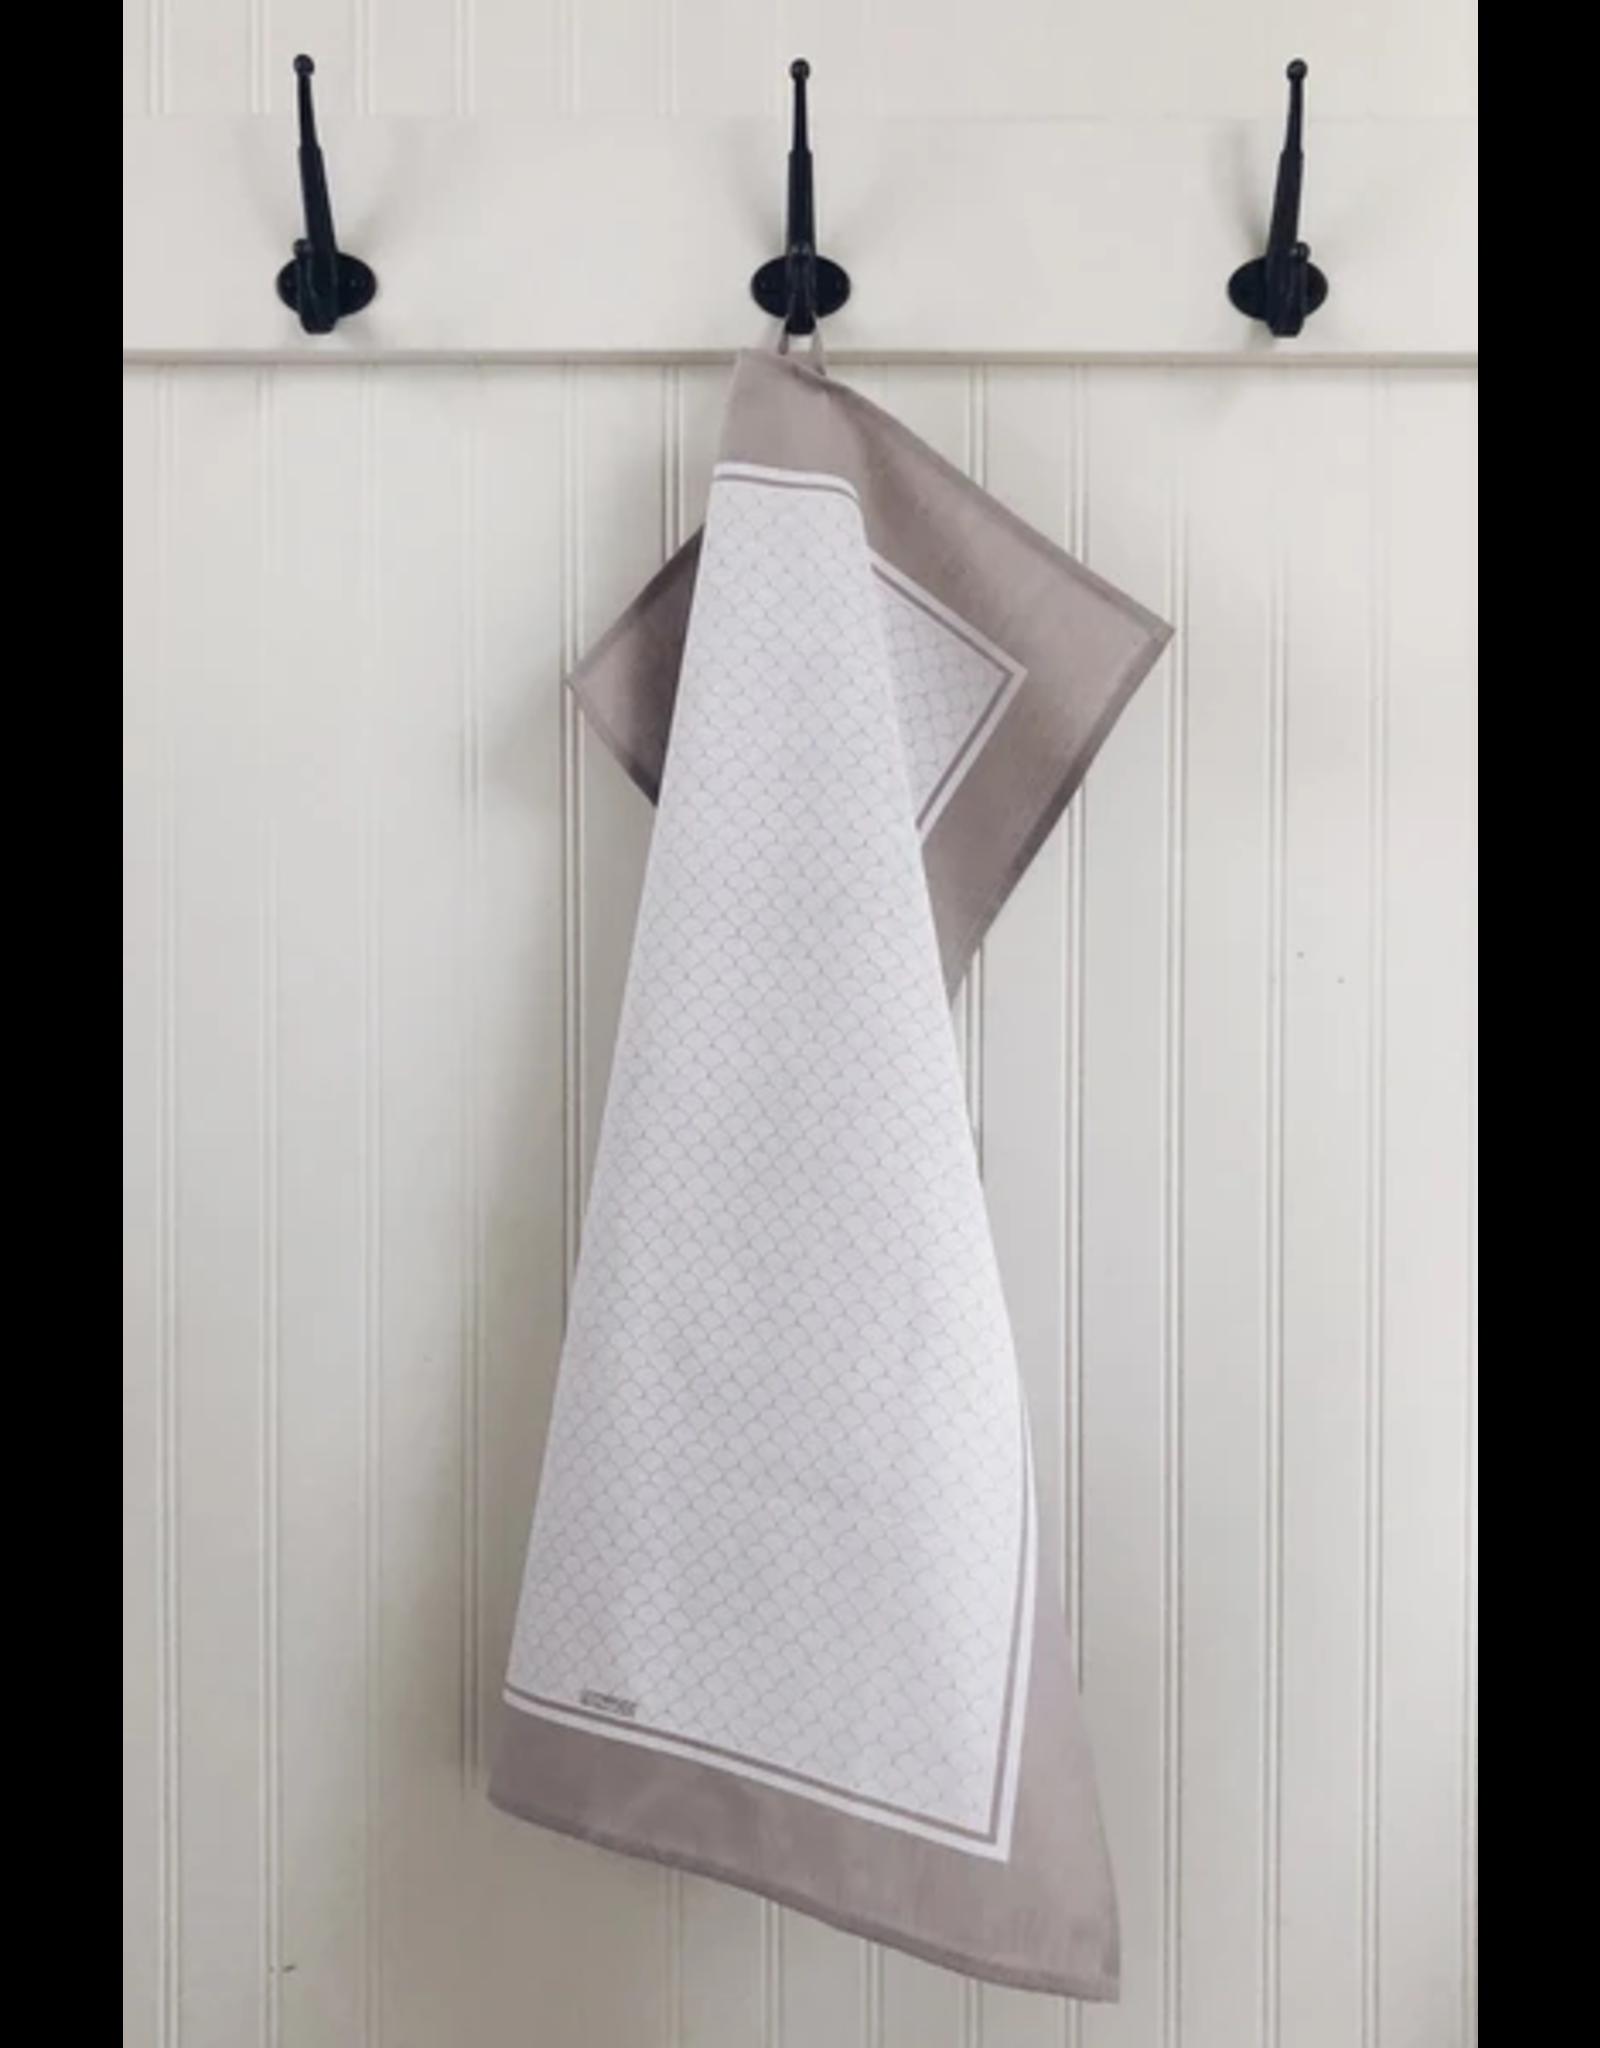 Ten & Co Tea Towel Scallop White on Warm Grey